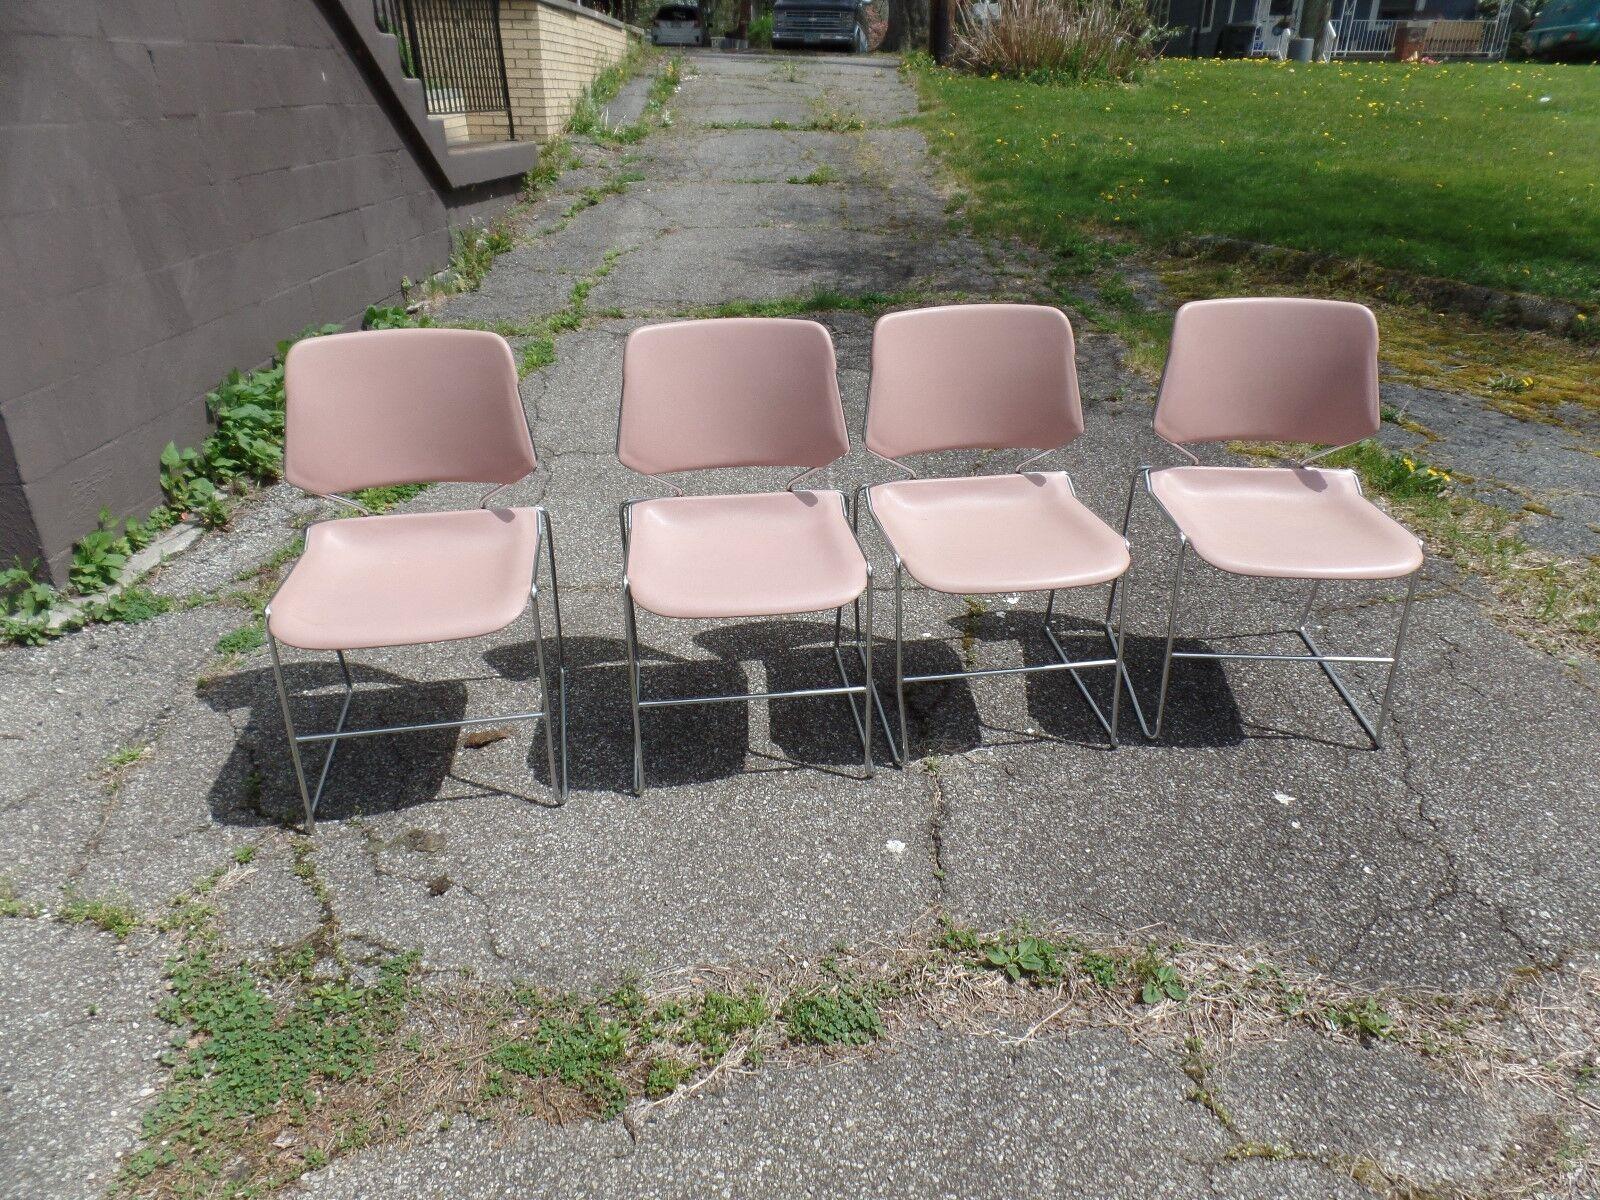 Krueger Matrix Stacking Chairs Chair Mid Century Modern